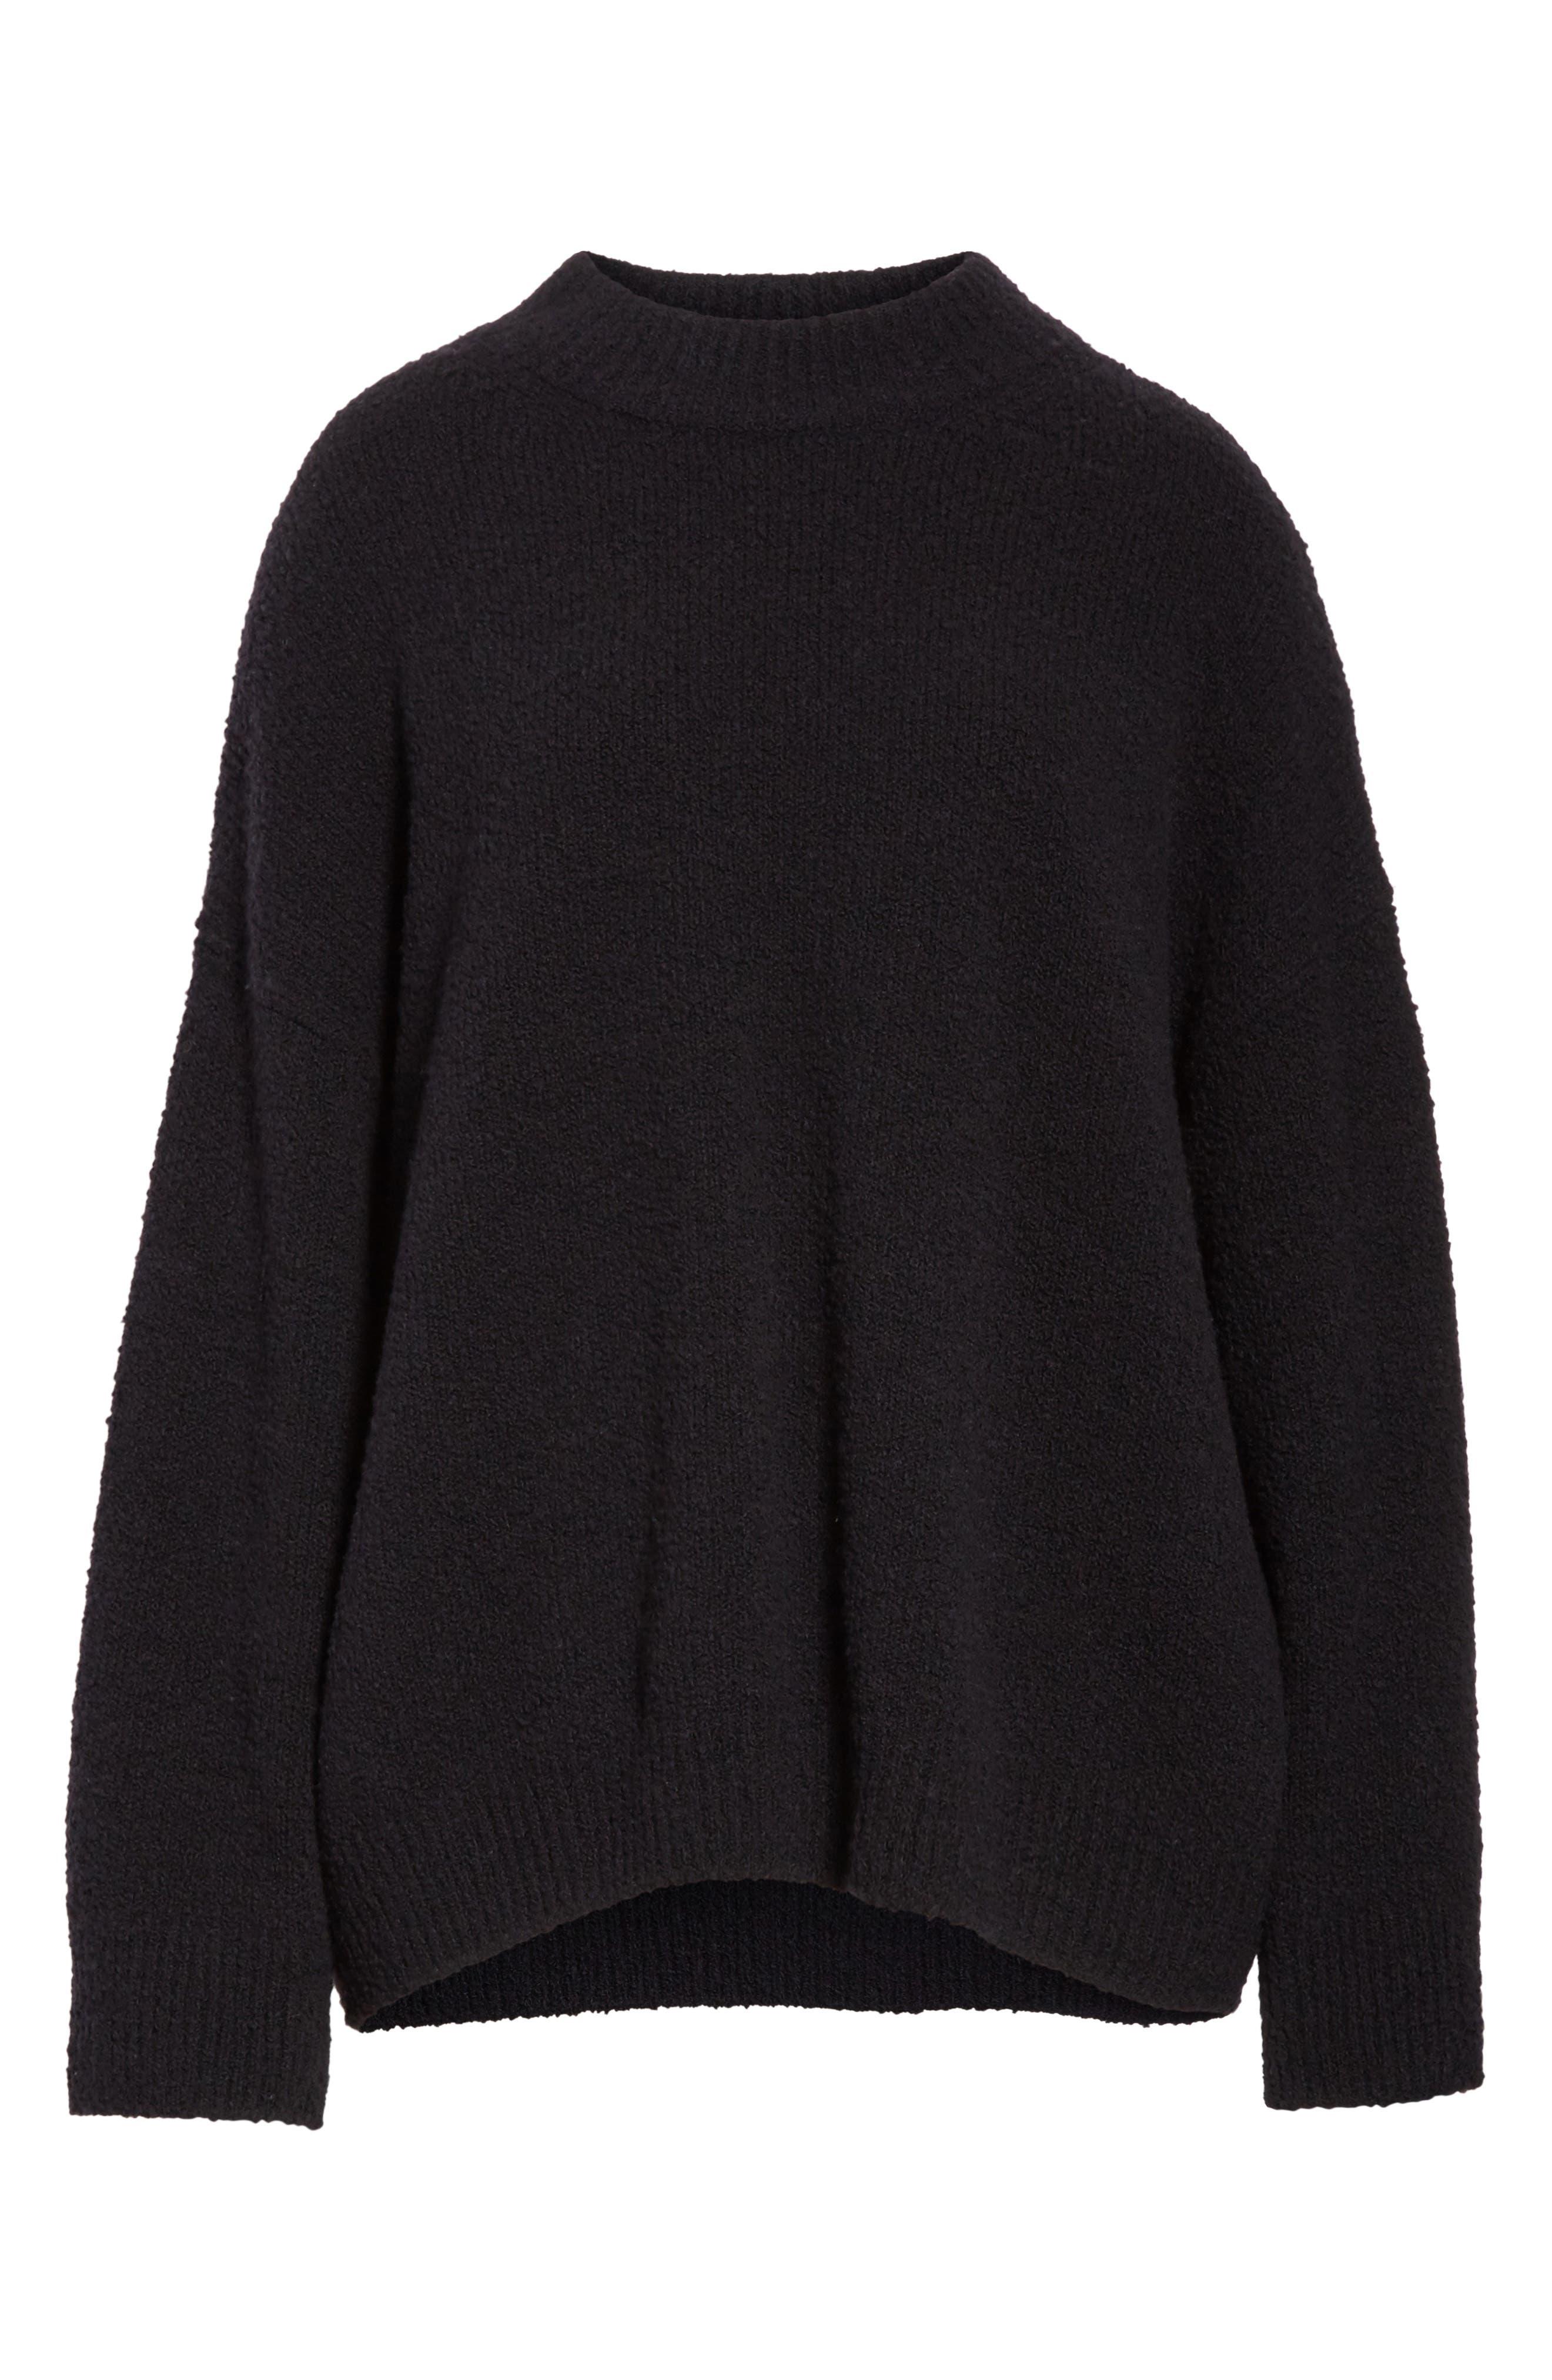 Boxy Knit Pullover,                             Alternate thumbnail 5, color,                             Black